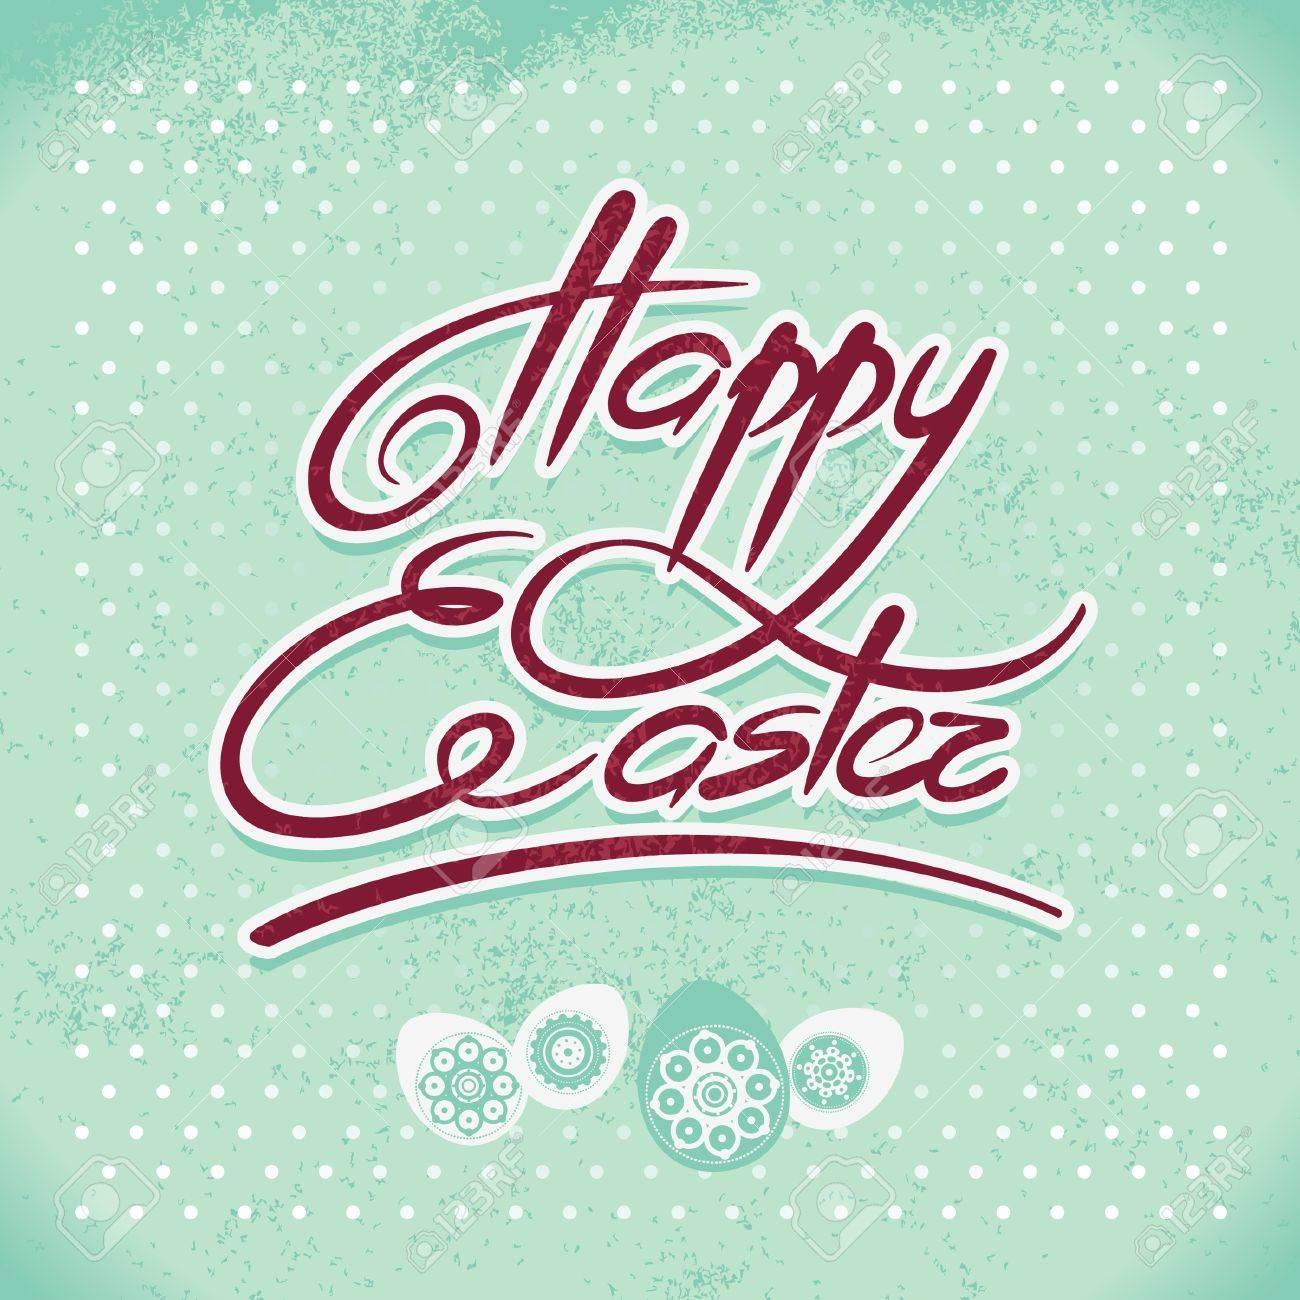 Happy Easter, hand lettering. Handmade calligraphy Stock Vector - 18002461